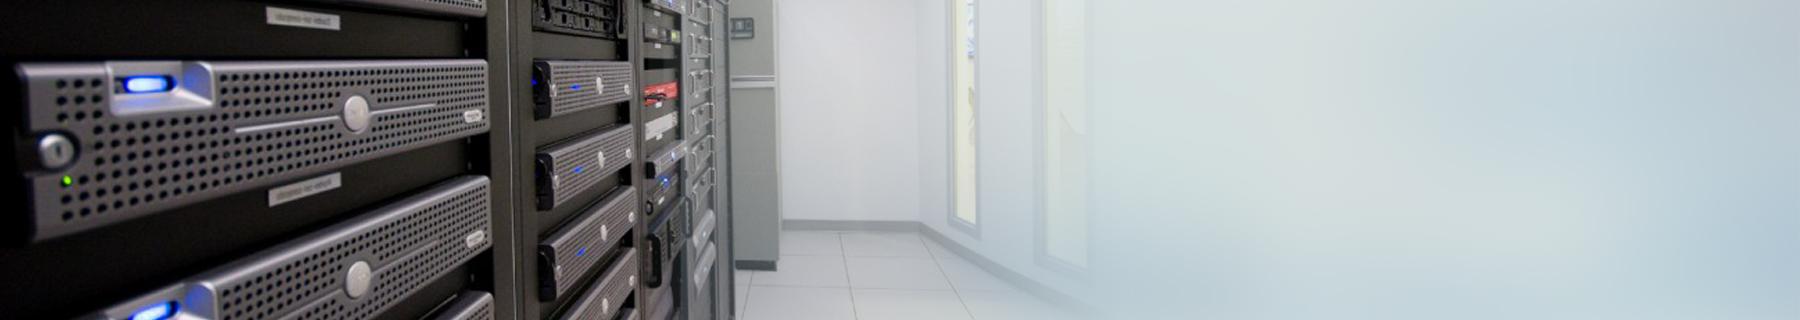 datacenter-1800×350